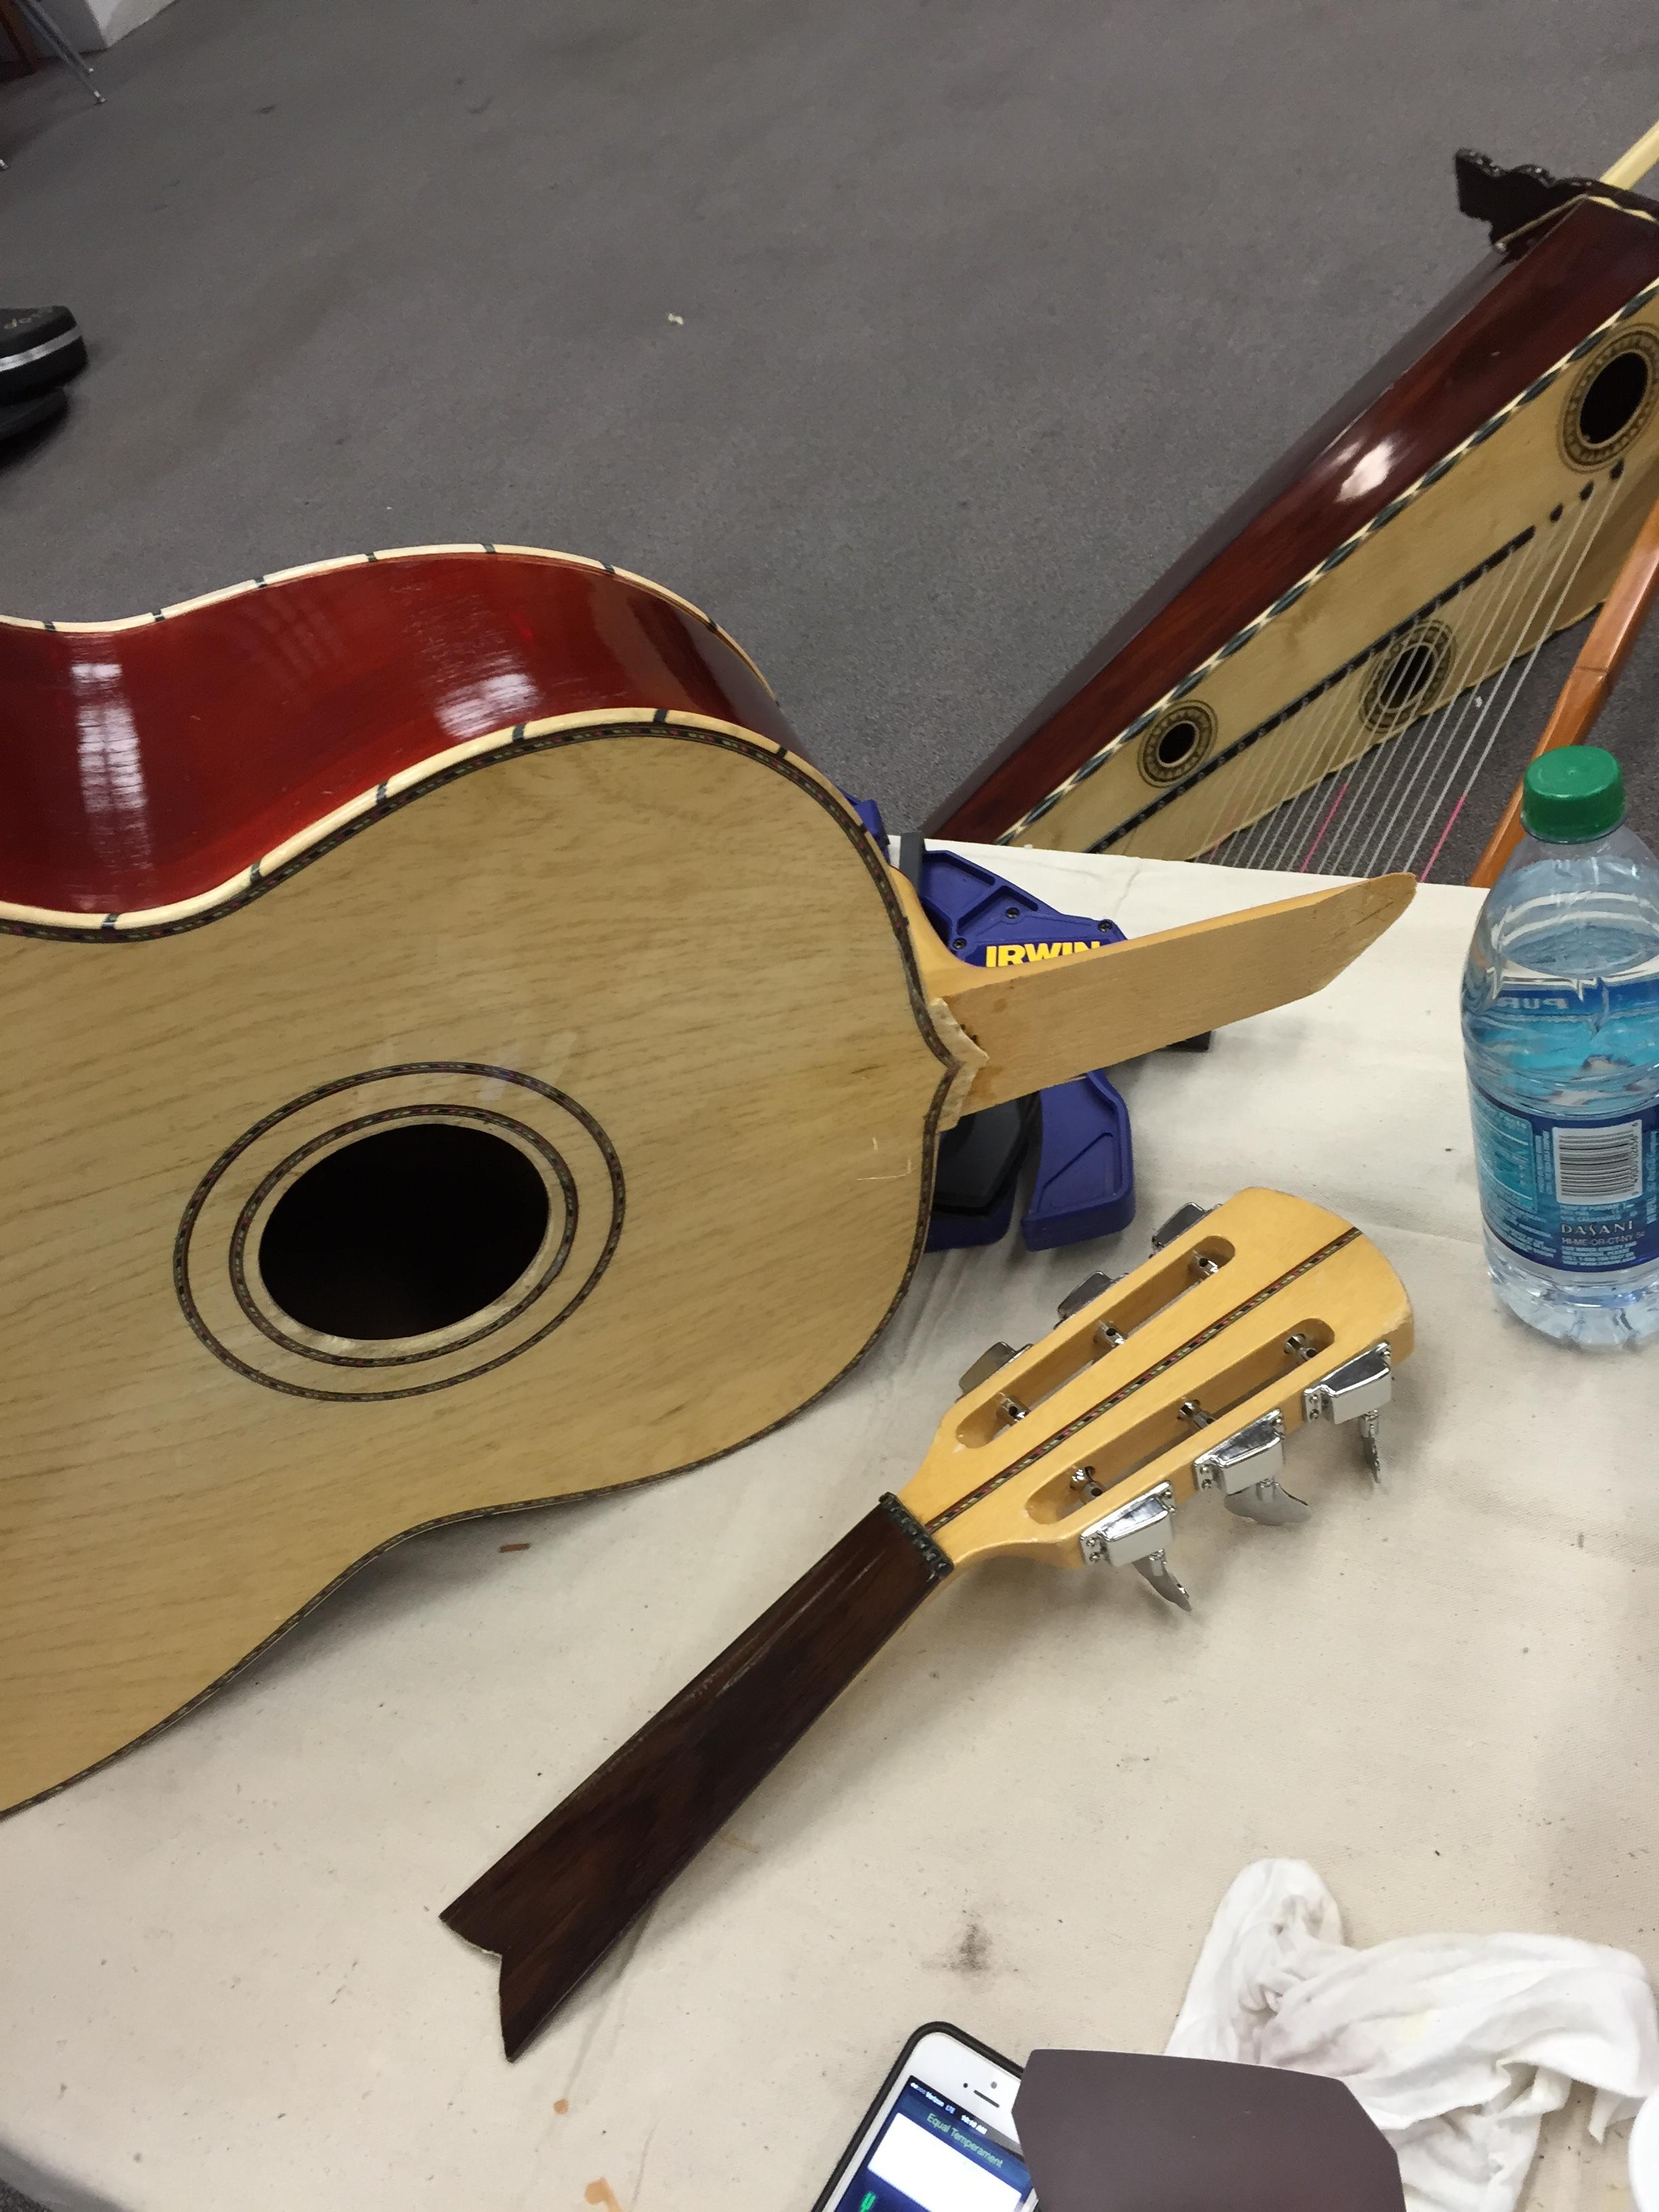 guitarron-a-before.jpg